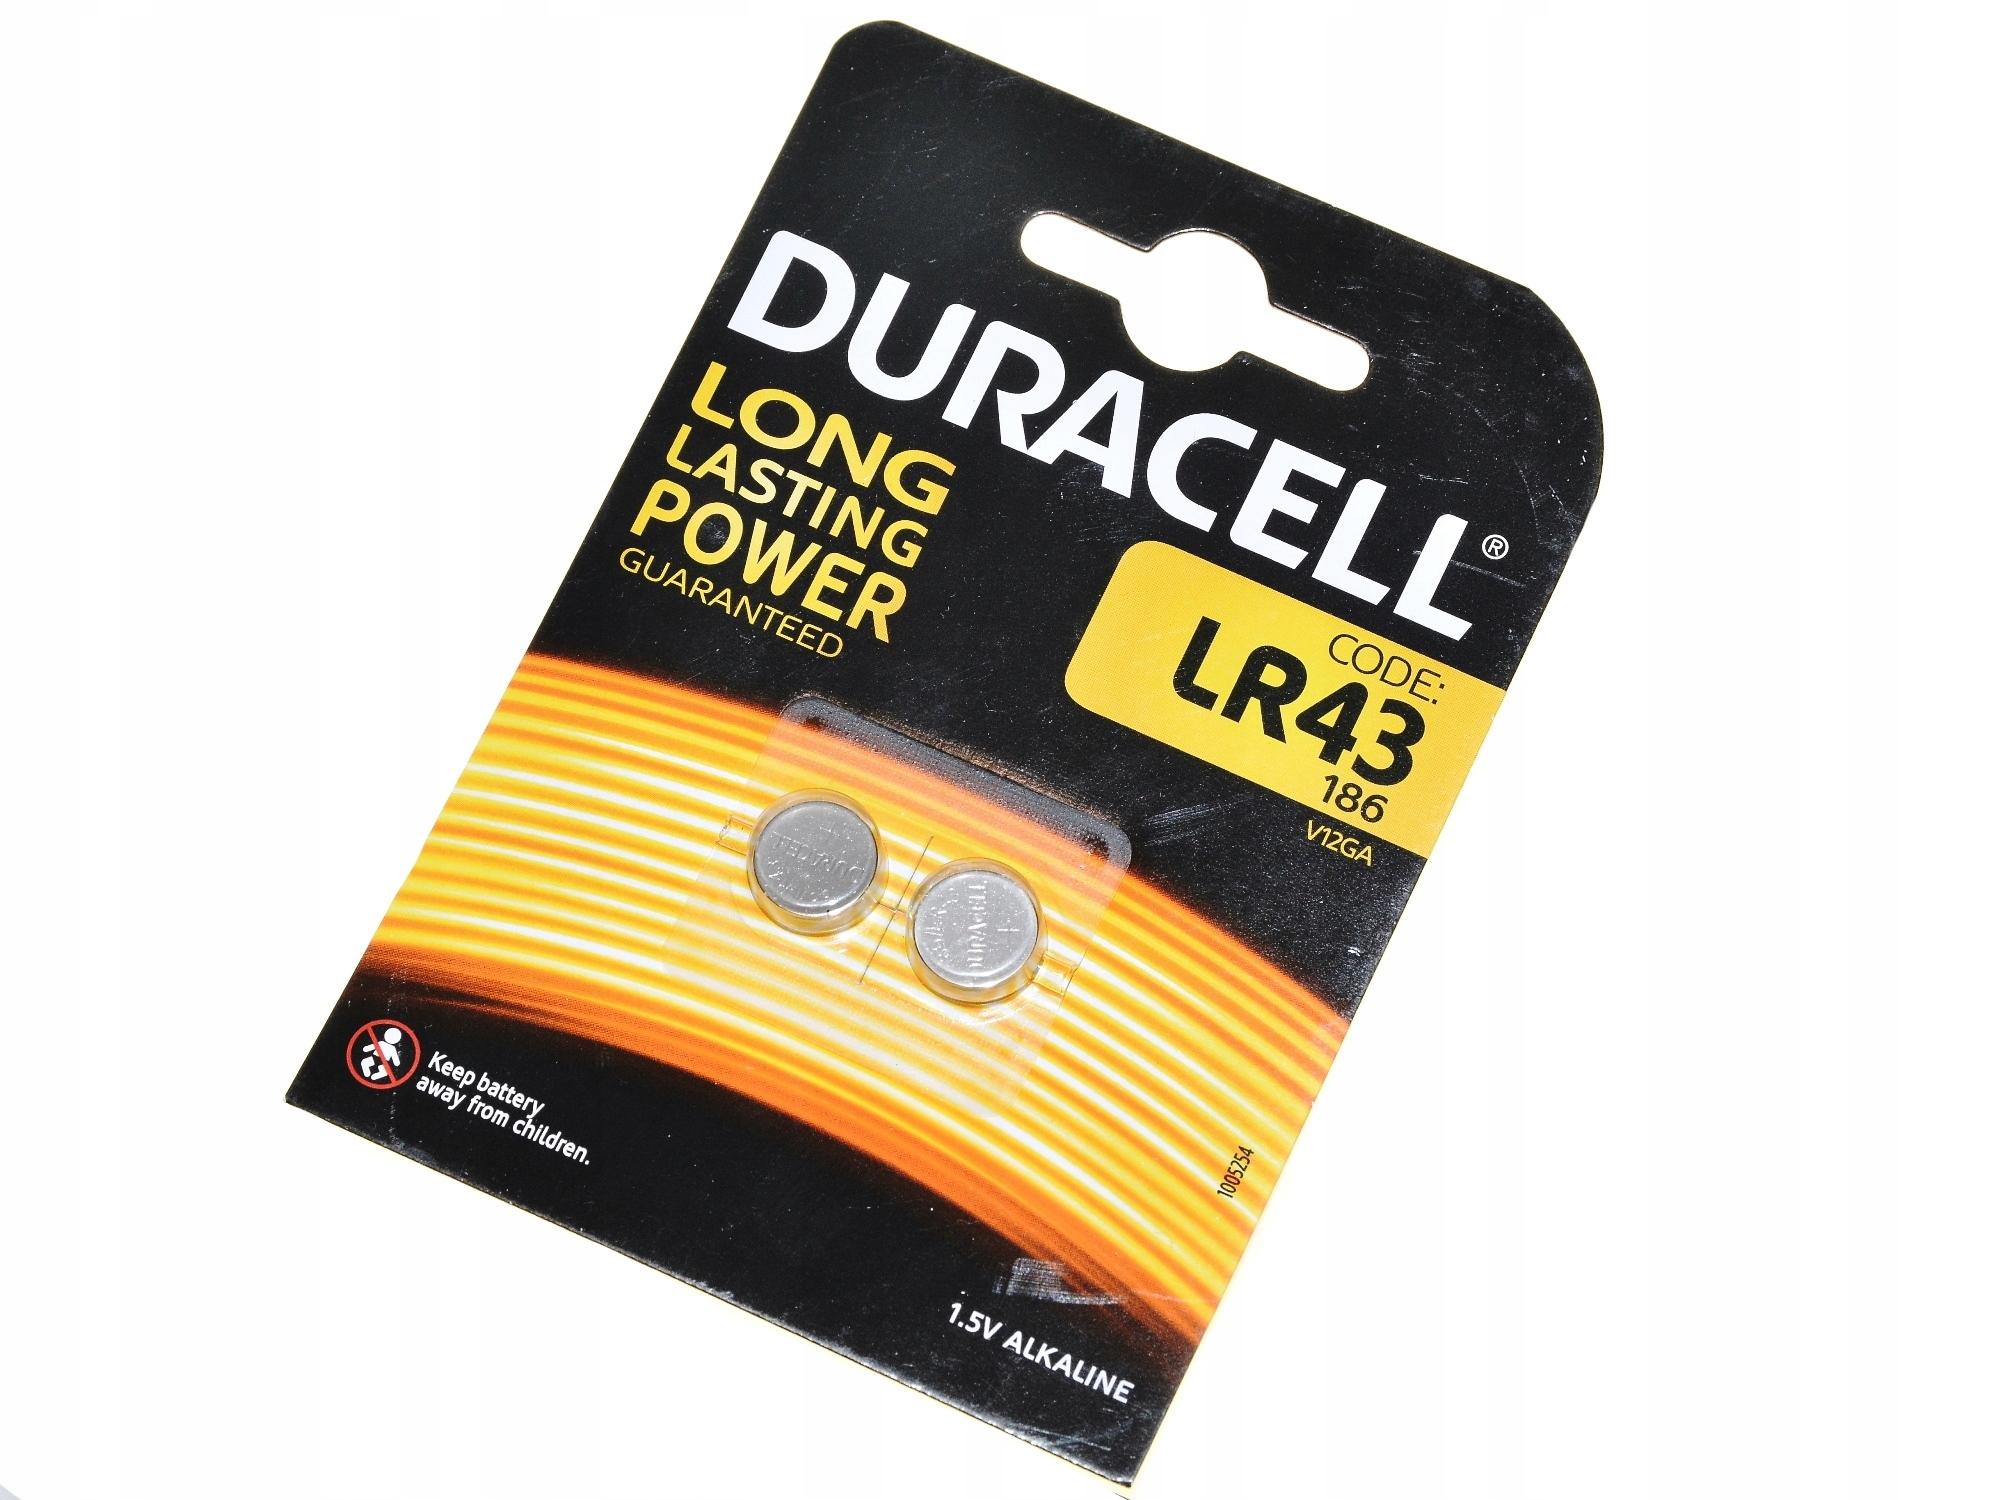 Batéria Duracell pre Zenita LR43 1.5V 2x Alkaline